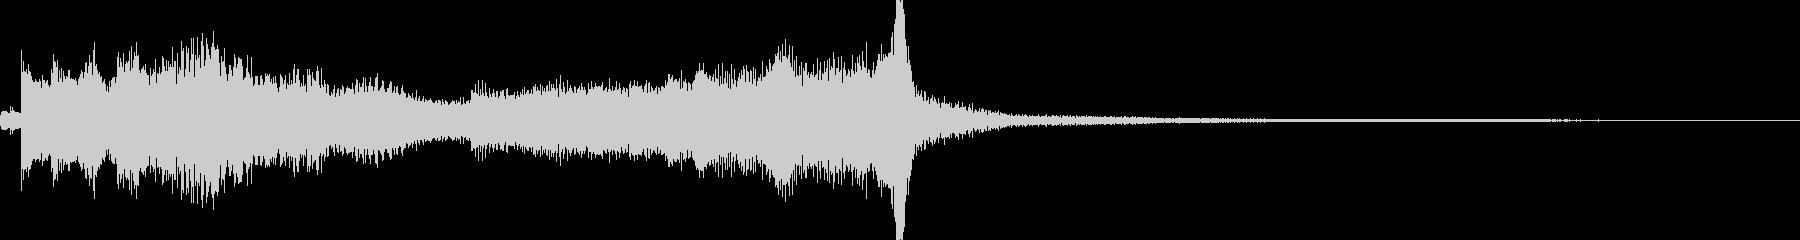 Depressing piano jingle's unreproduced waveform